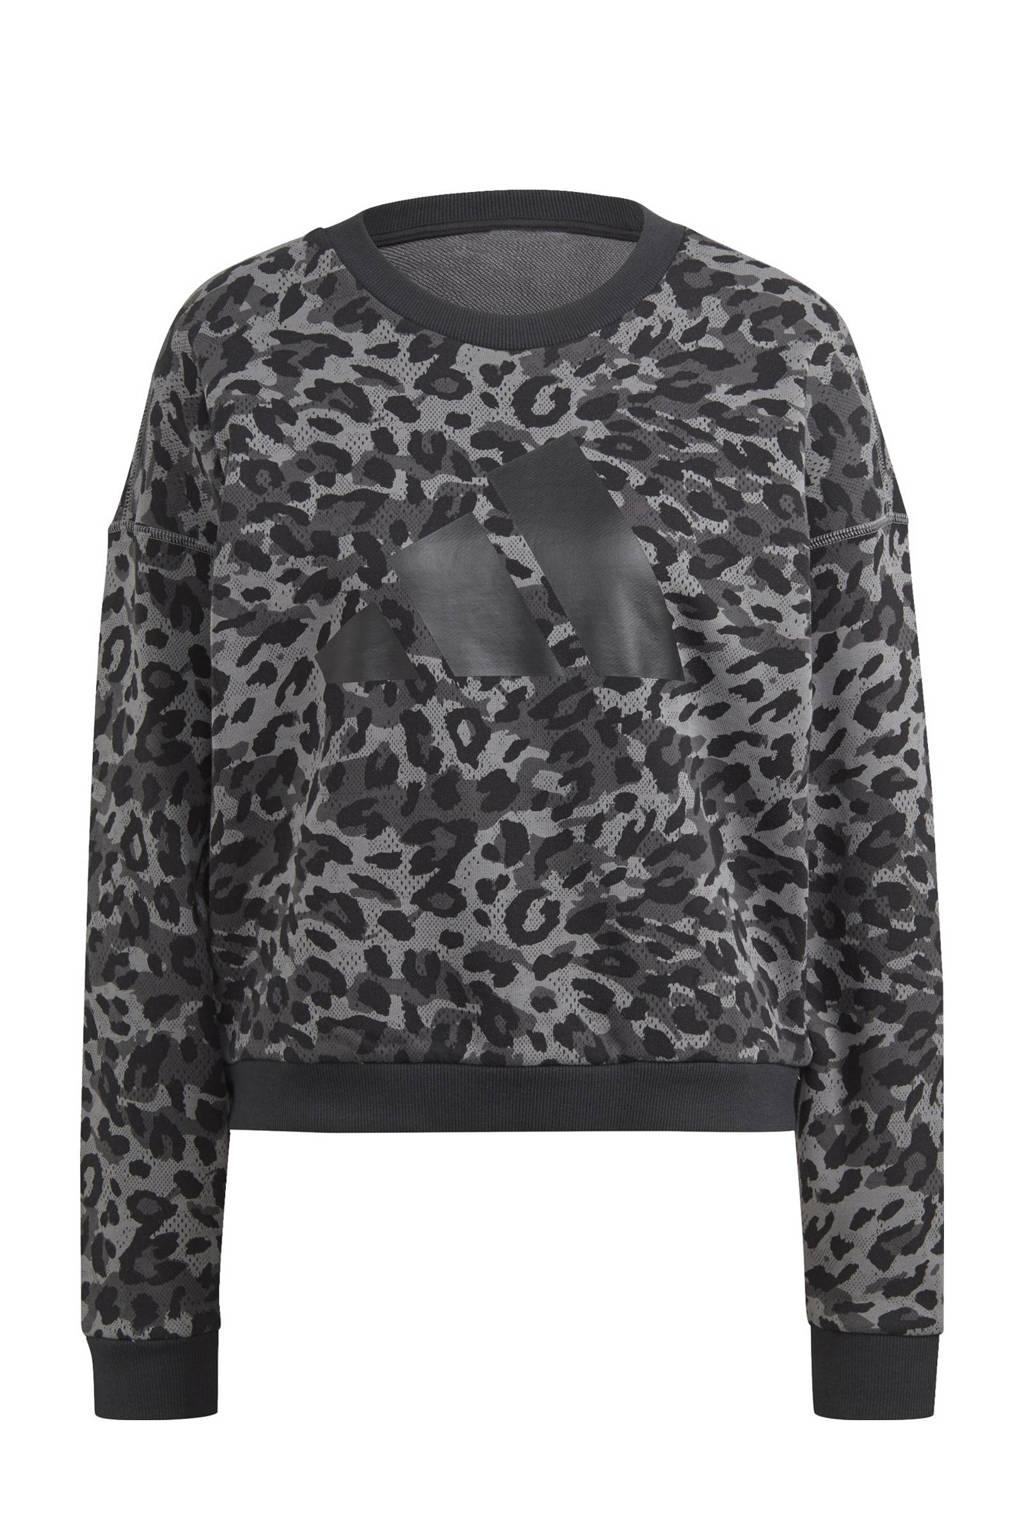 adidas Performance sportsweater grijs, Grijs